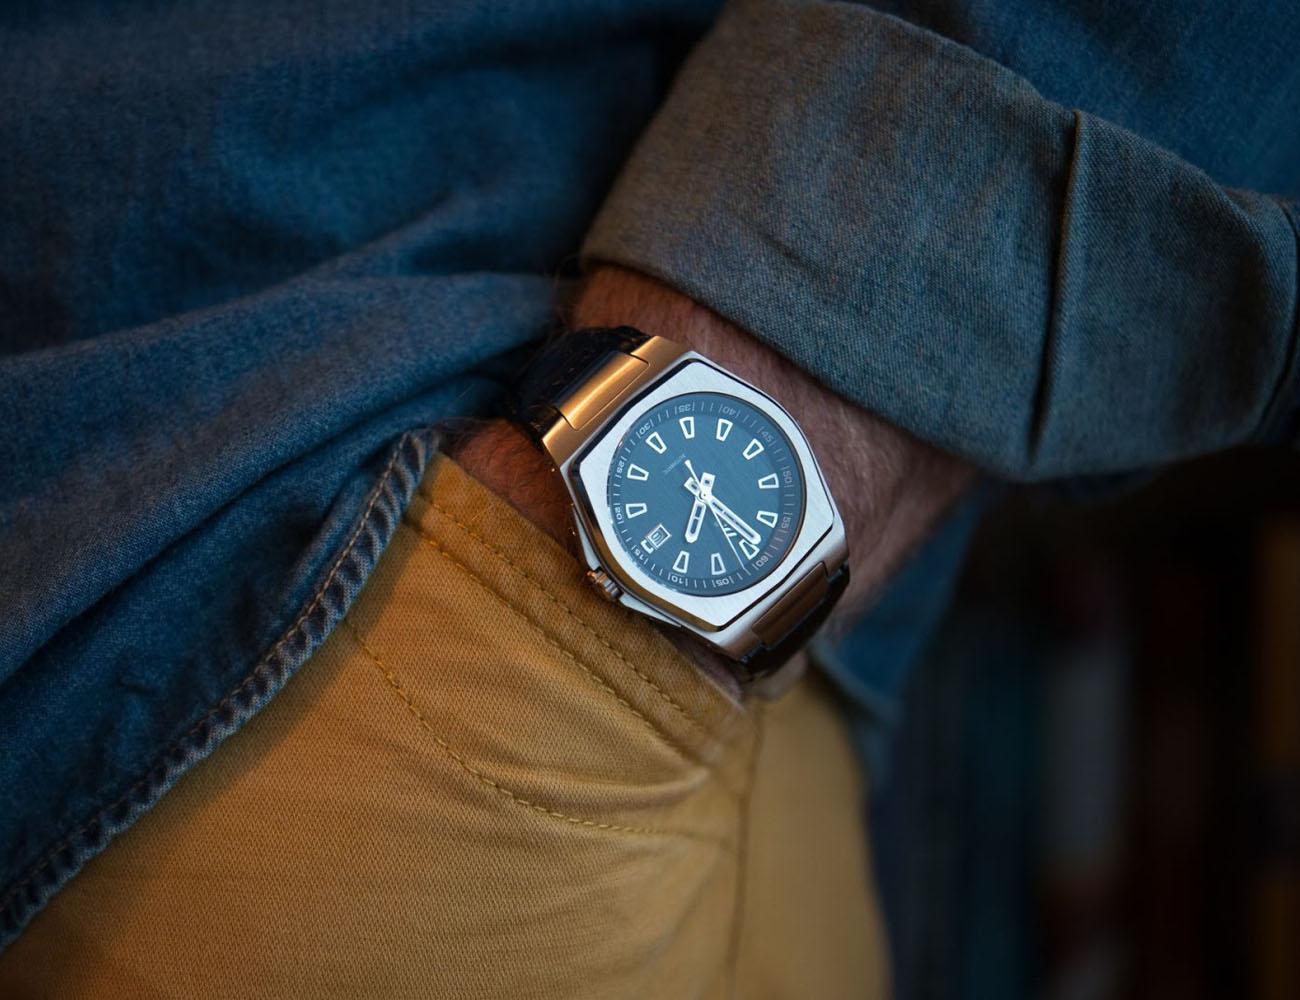 Seals+Watch+Company+%E2%80%93+Elegant+Automatic+Wrist+Watches